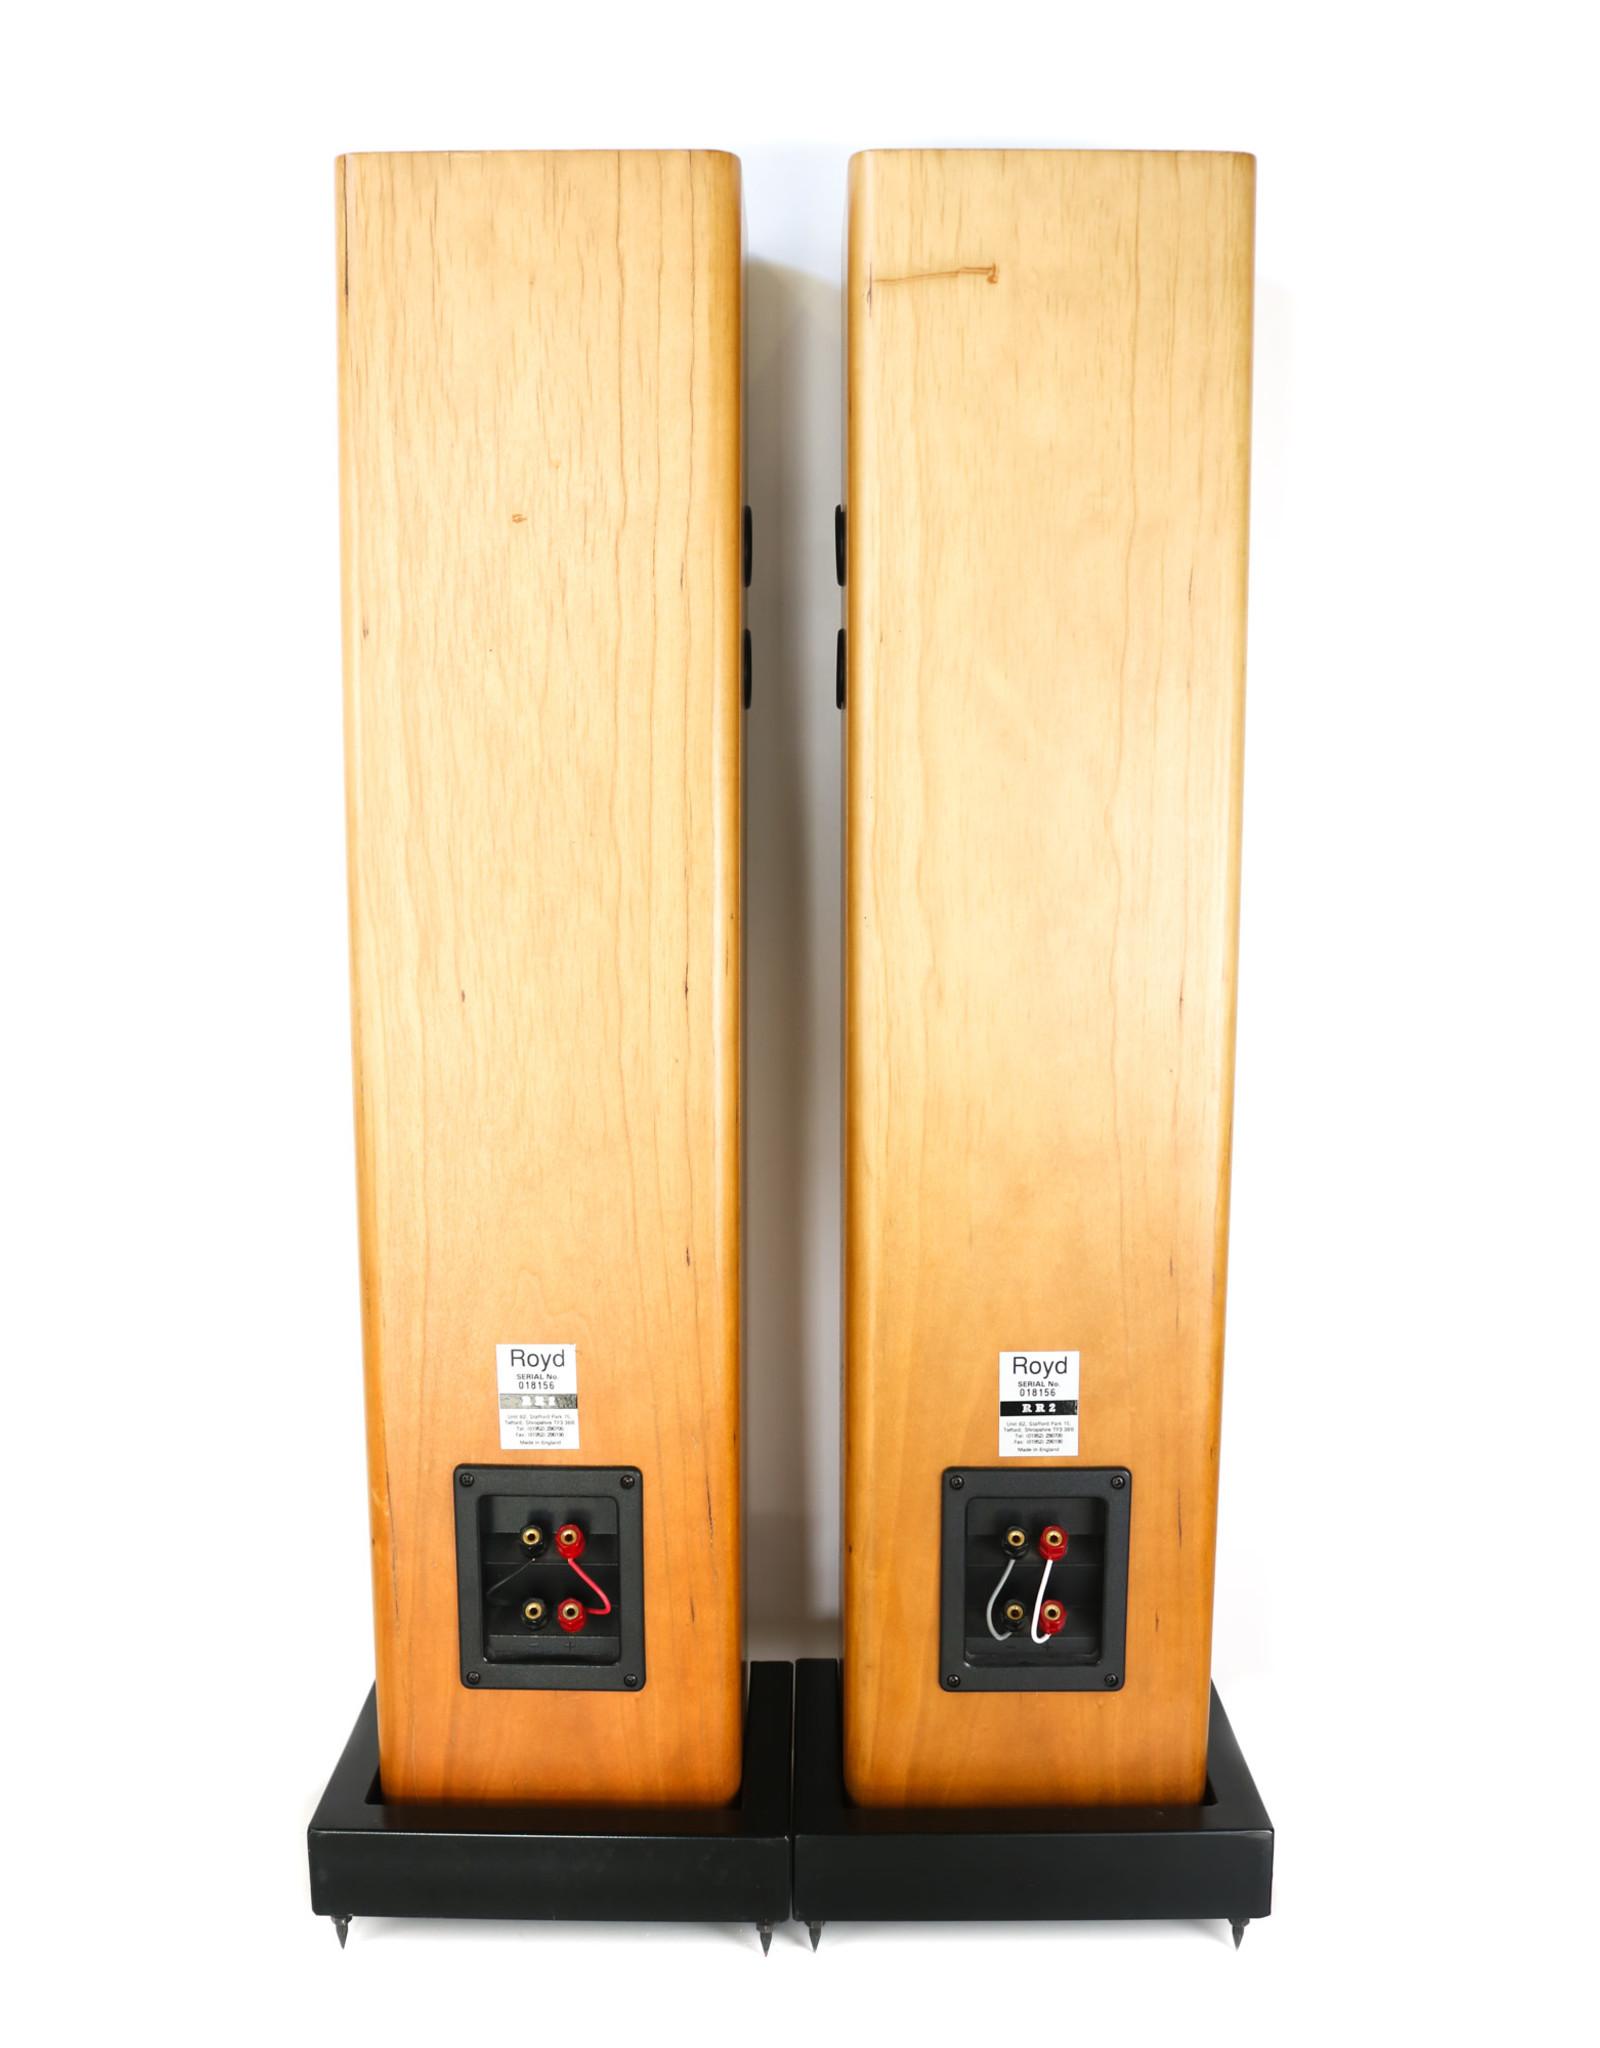 Royd Royd RR2 Floorstanding Speakers USED